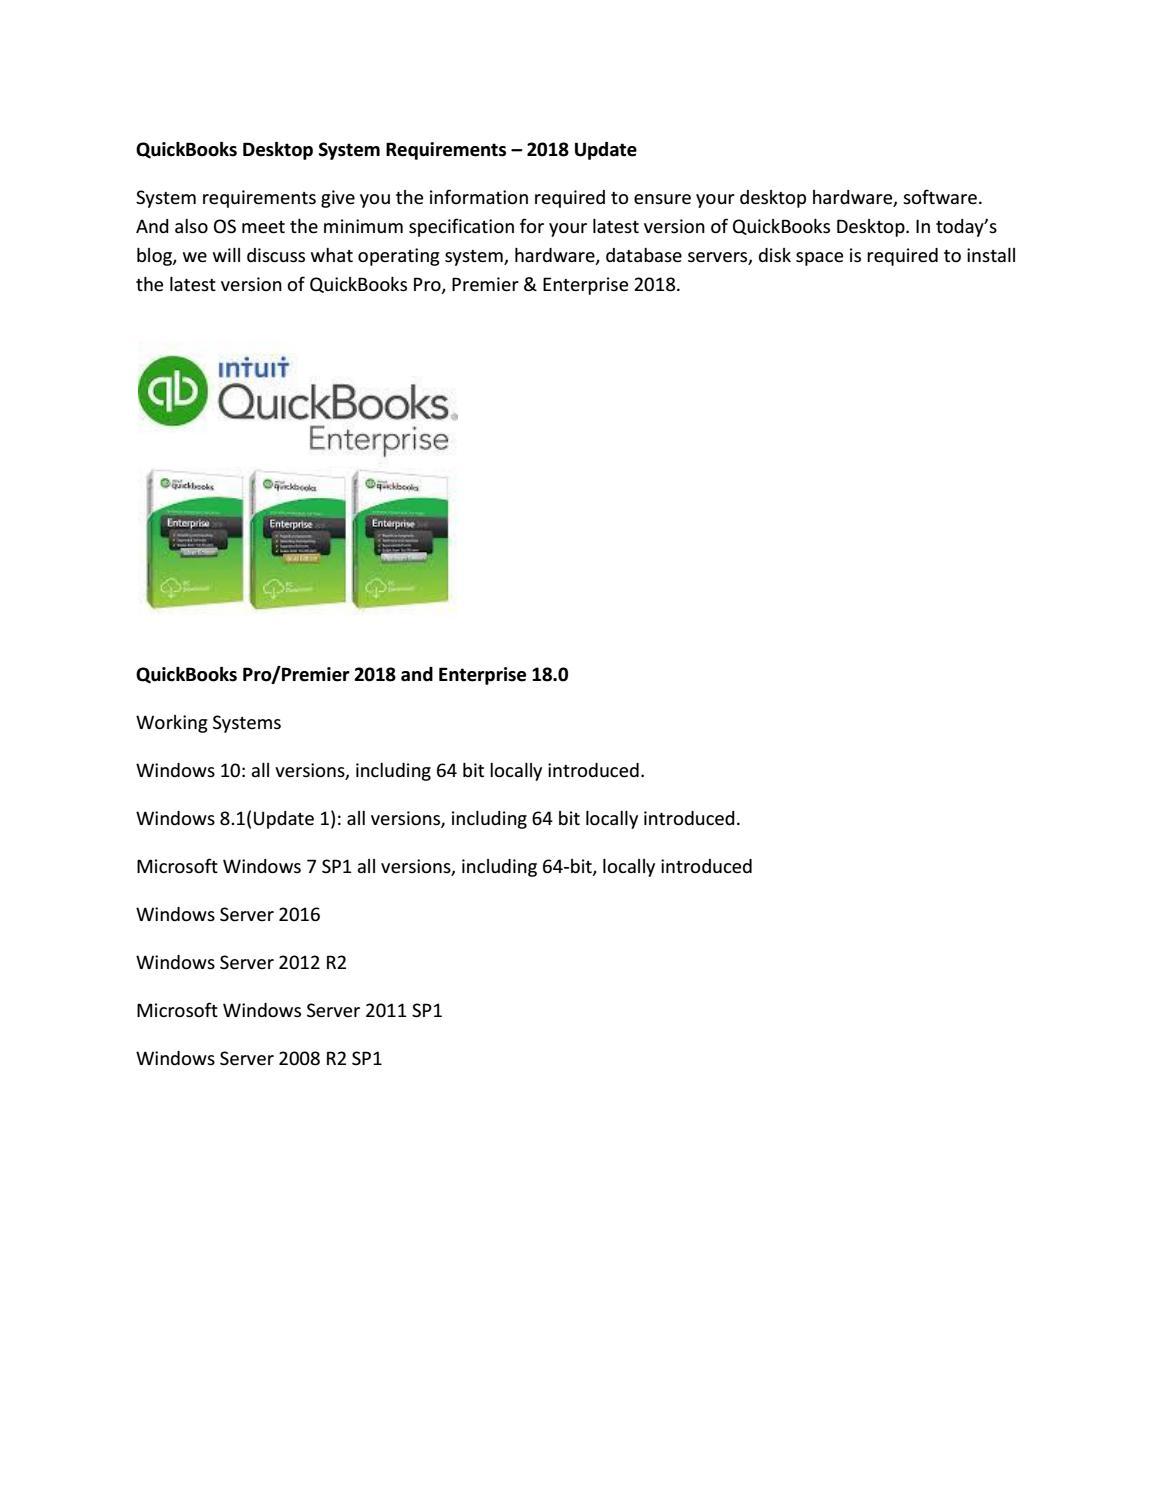 will quickbooks pro 2011 work with windows 10